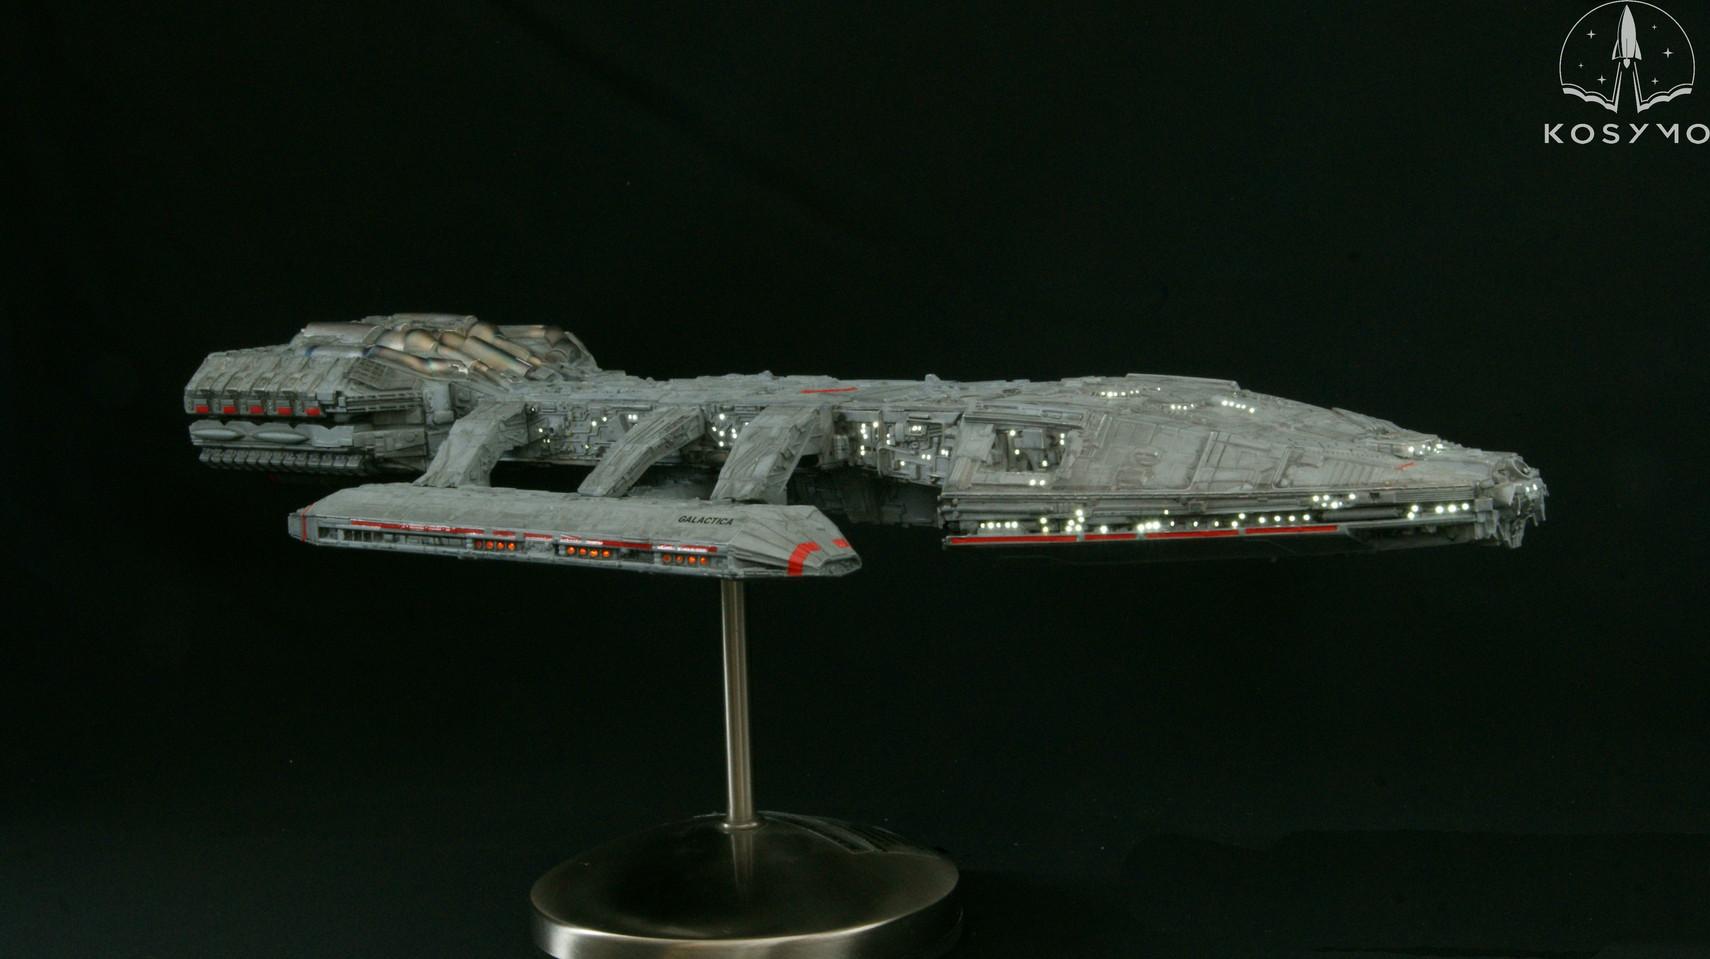 Galactica_035.JPG